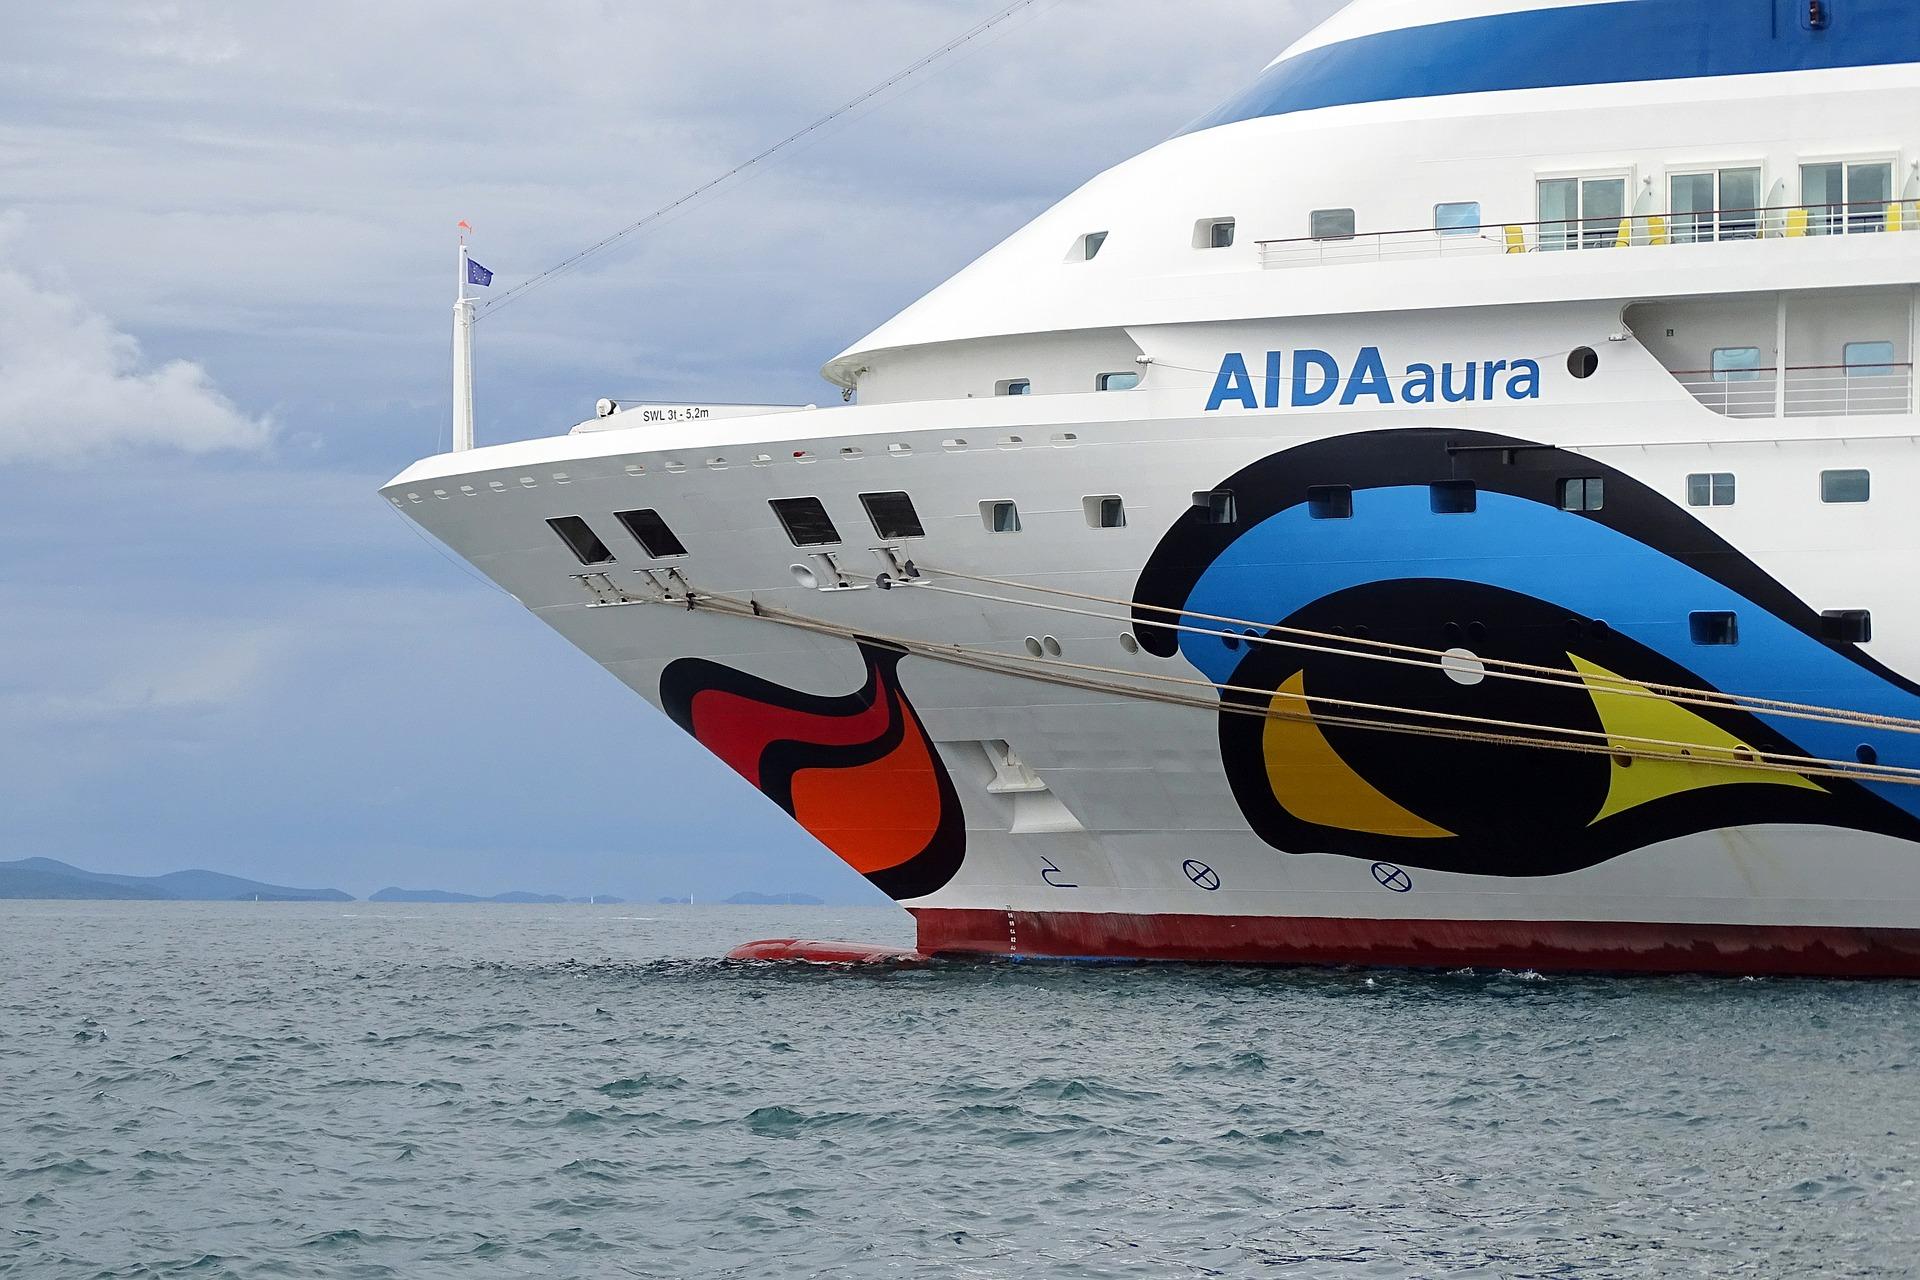 AIDA Weltreise 2020 mit AIDAaura